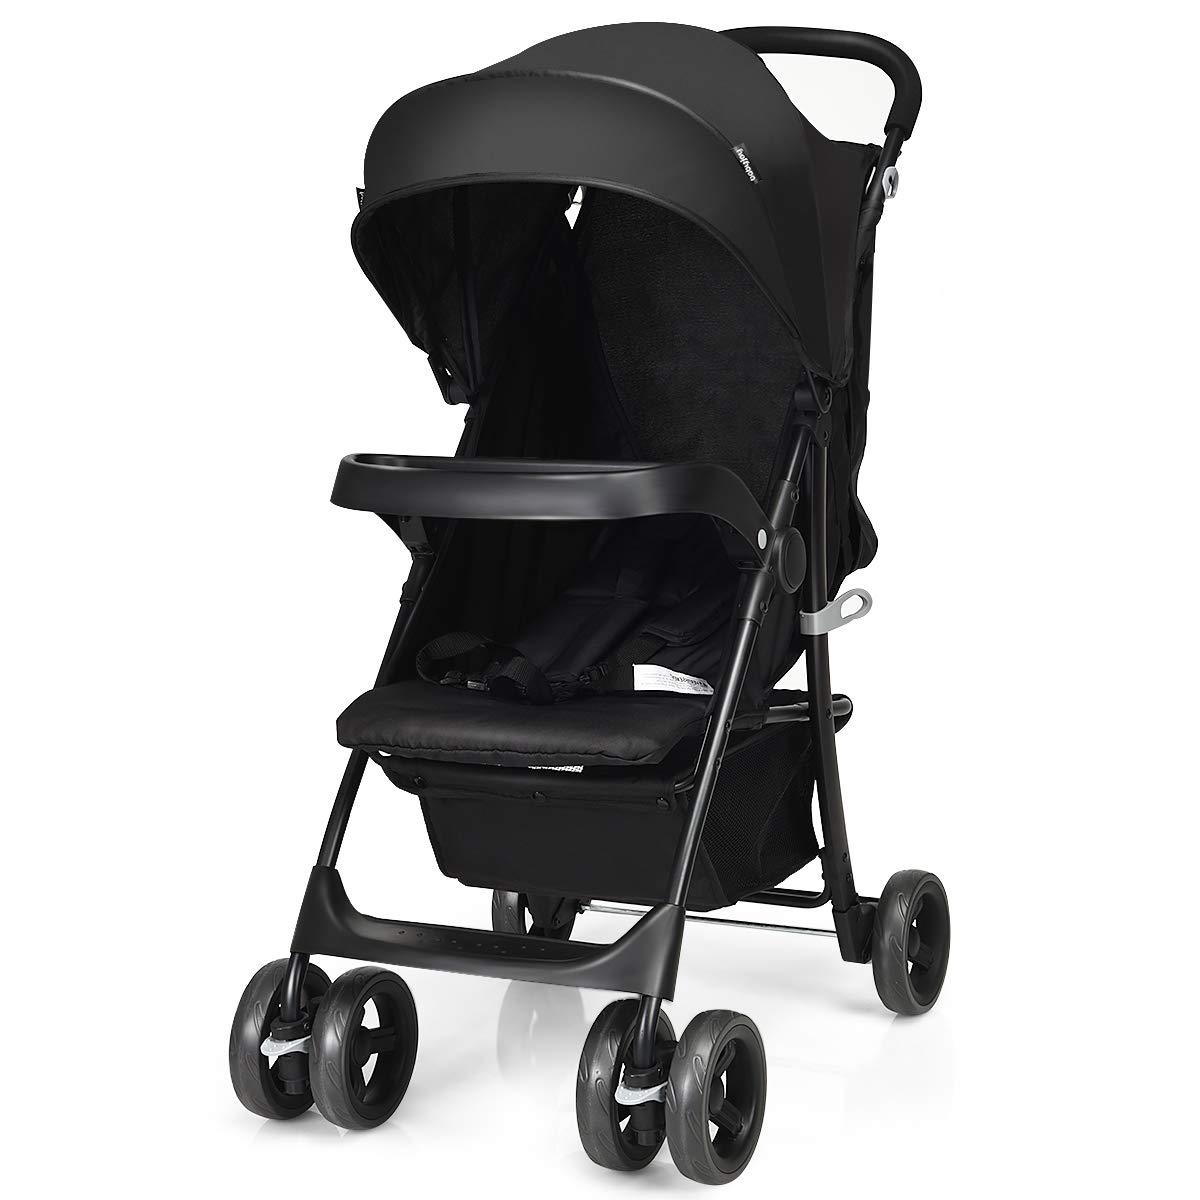 GYMAX Adjustable Stroller Black Detachable Snack Plate Lockable Wheels Foldable Baby Pram Pushchair with Storage Basket